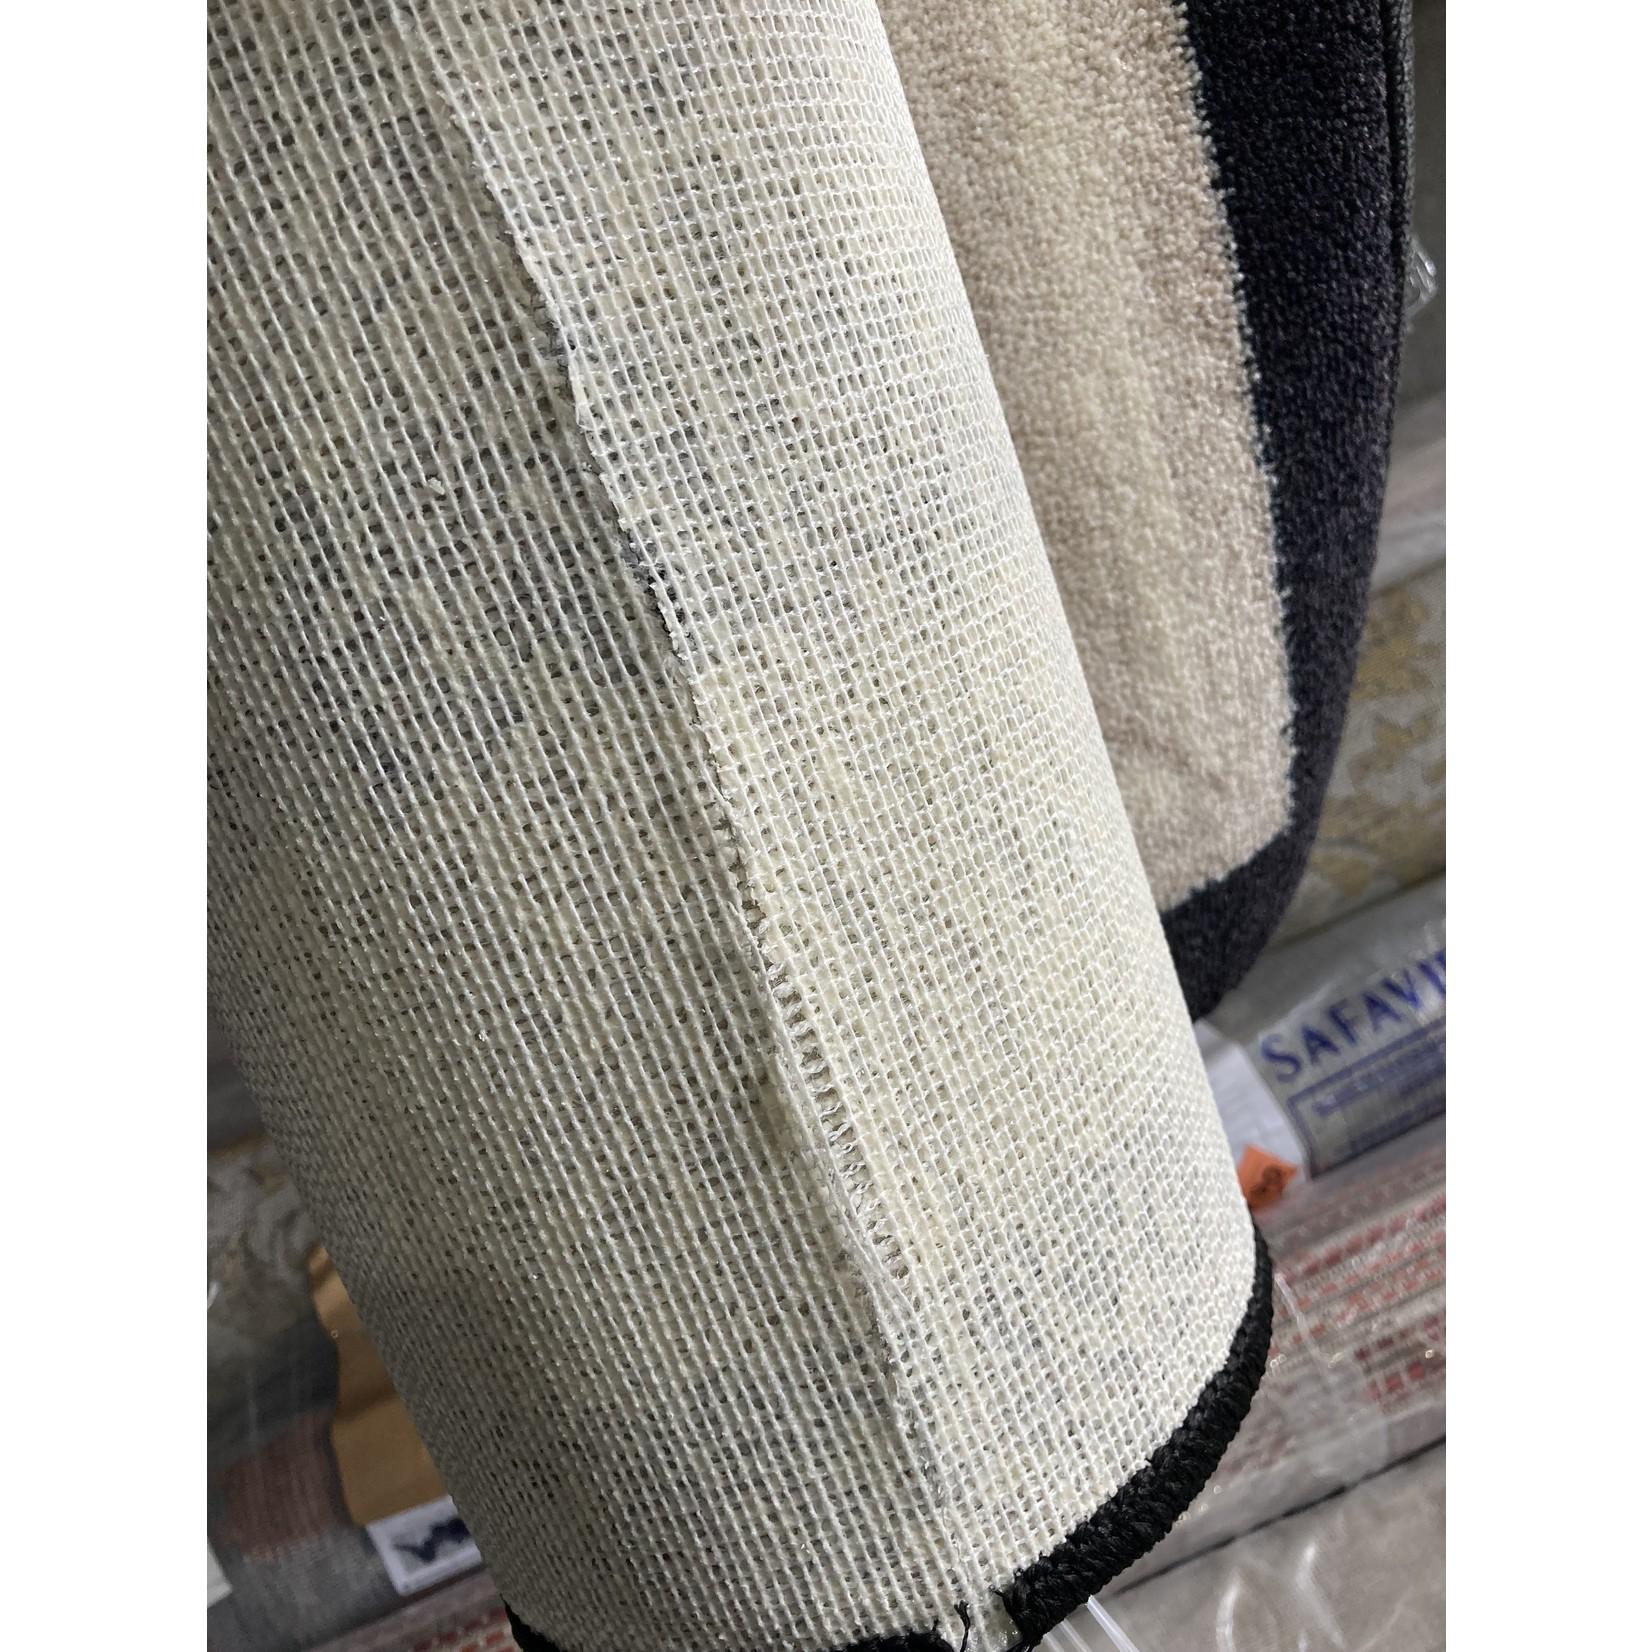 "*5'4"" x 7'8"" - Collinsville Animal Print Handmade Tufted Opal Area Rug - Slight Damage to Back"